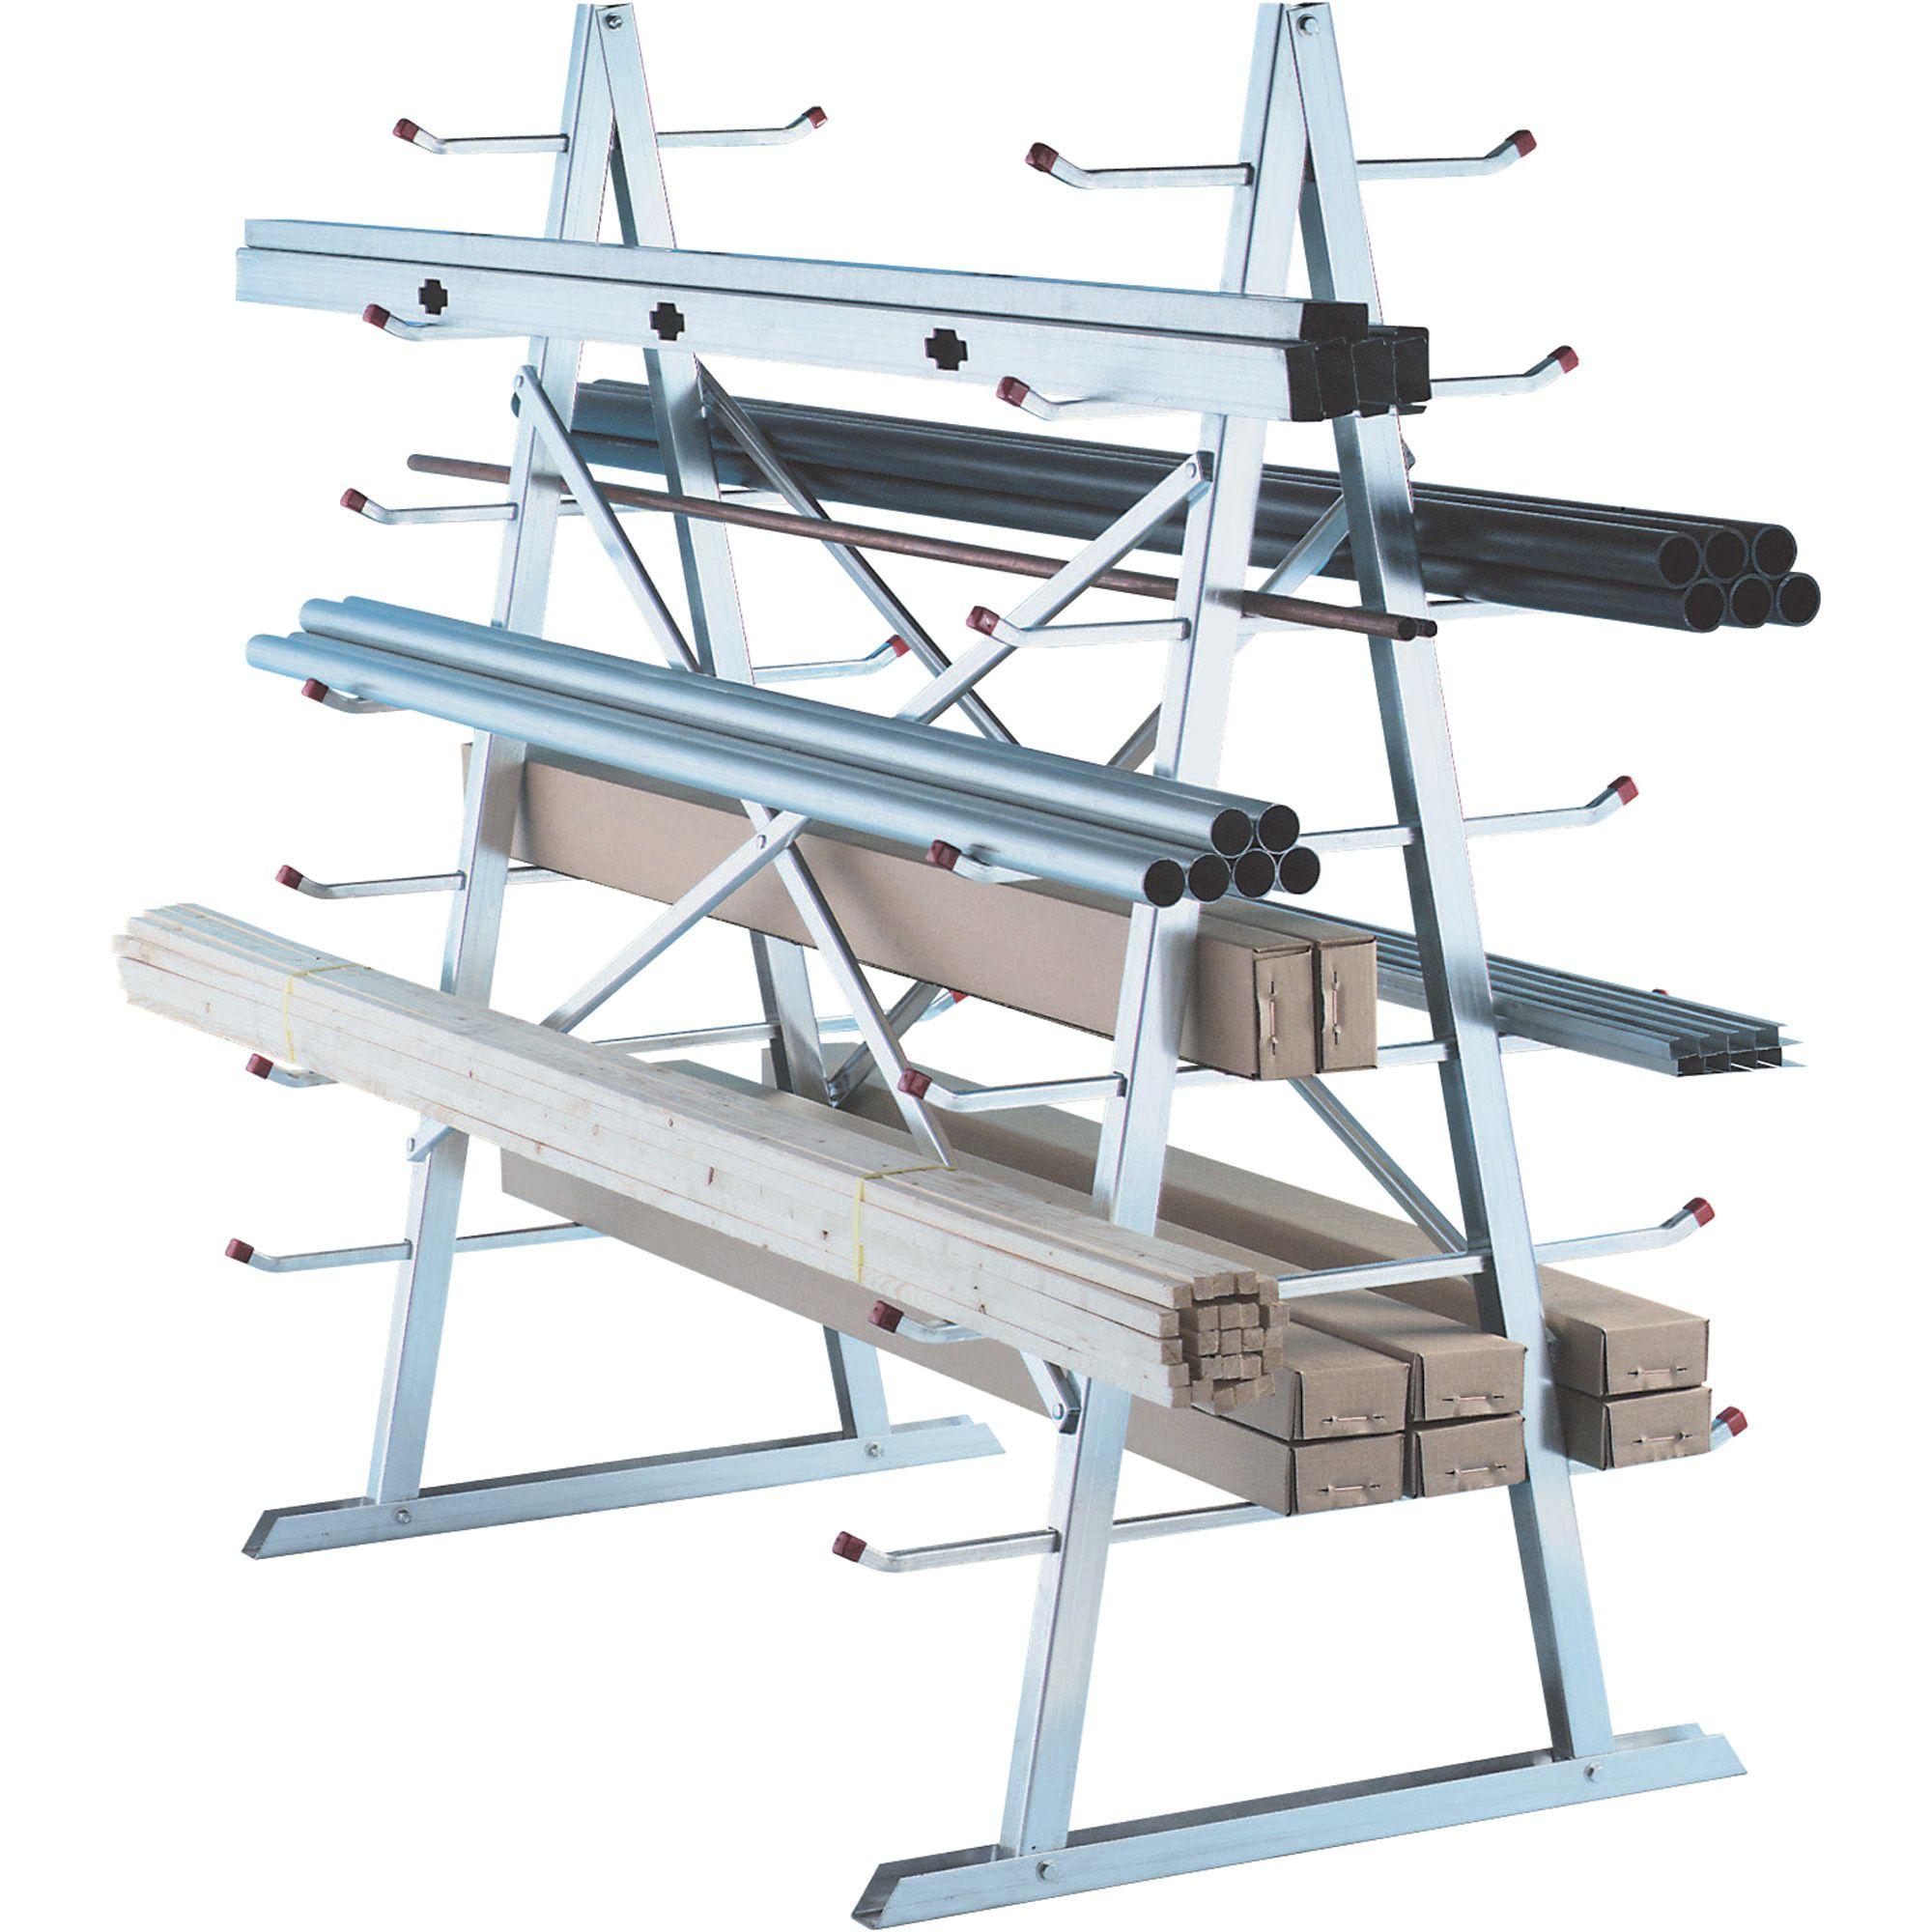 West Horizontal Storage Rack 5ft X 3ft X 5 1 2ft Size